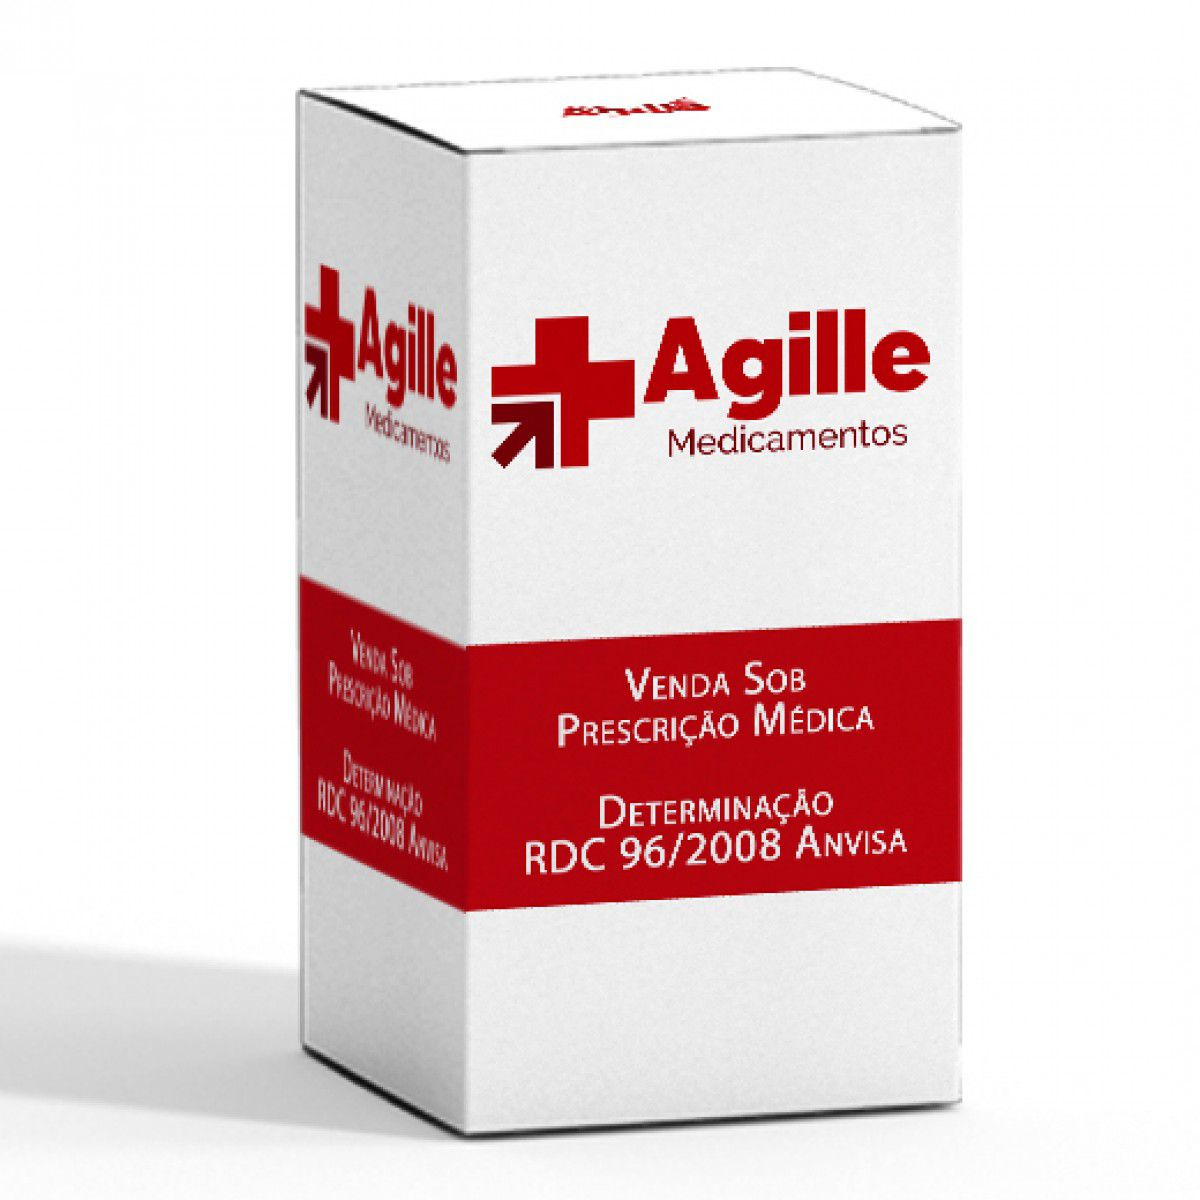 TAMOXIFENO 10 MG C/ 30 CPR  - Agille Speciality